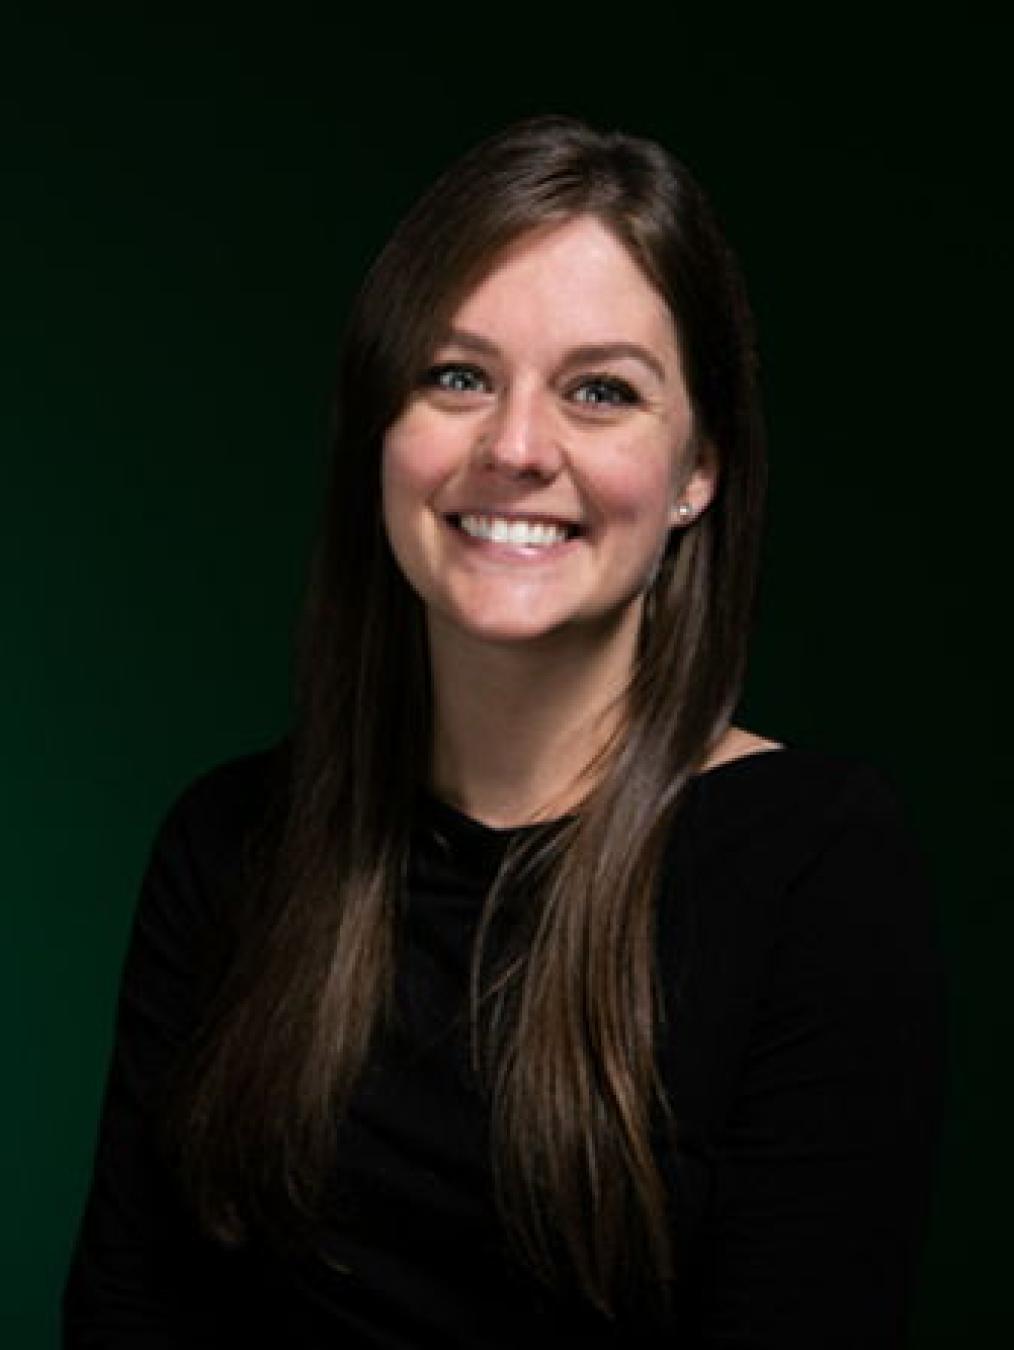 Rachelle Haines - Design Lead